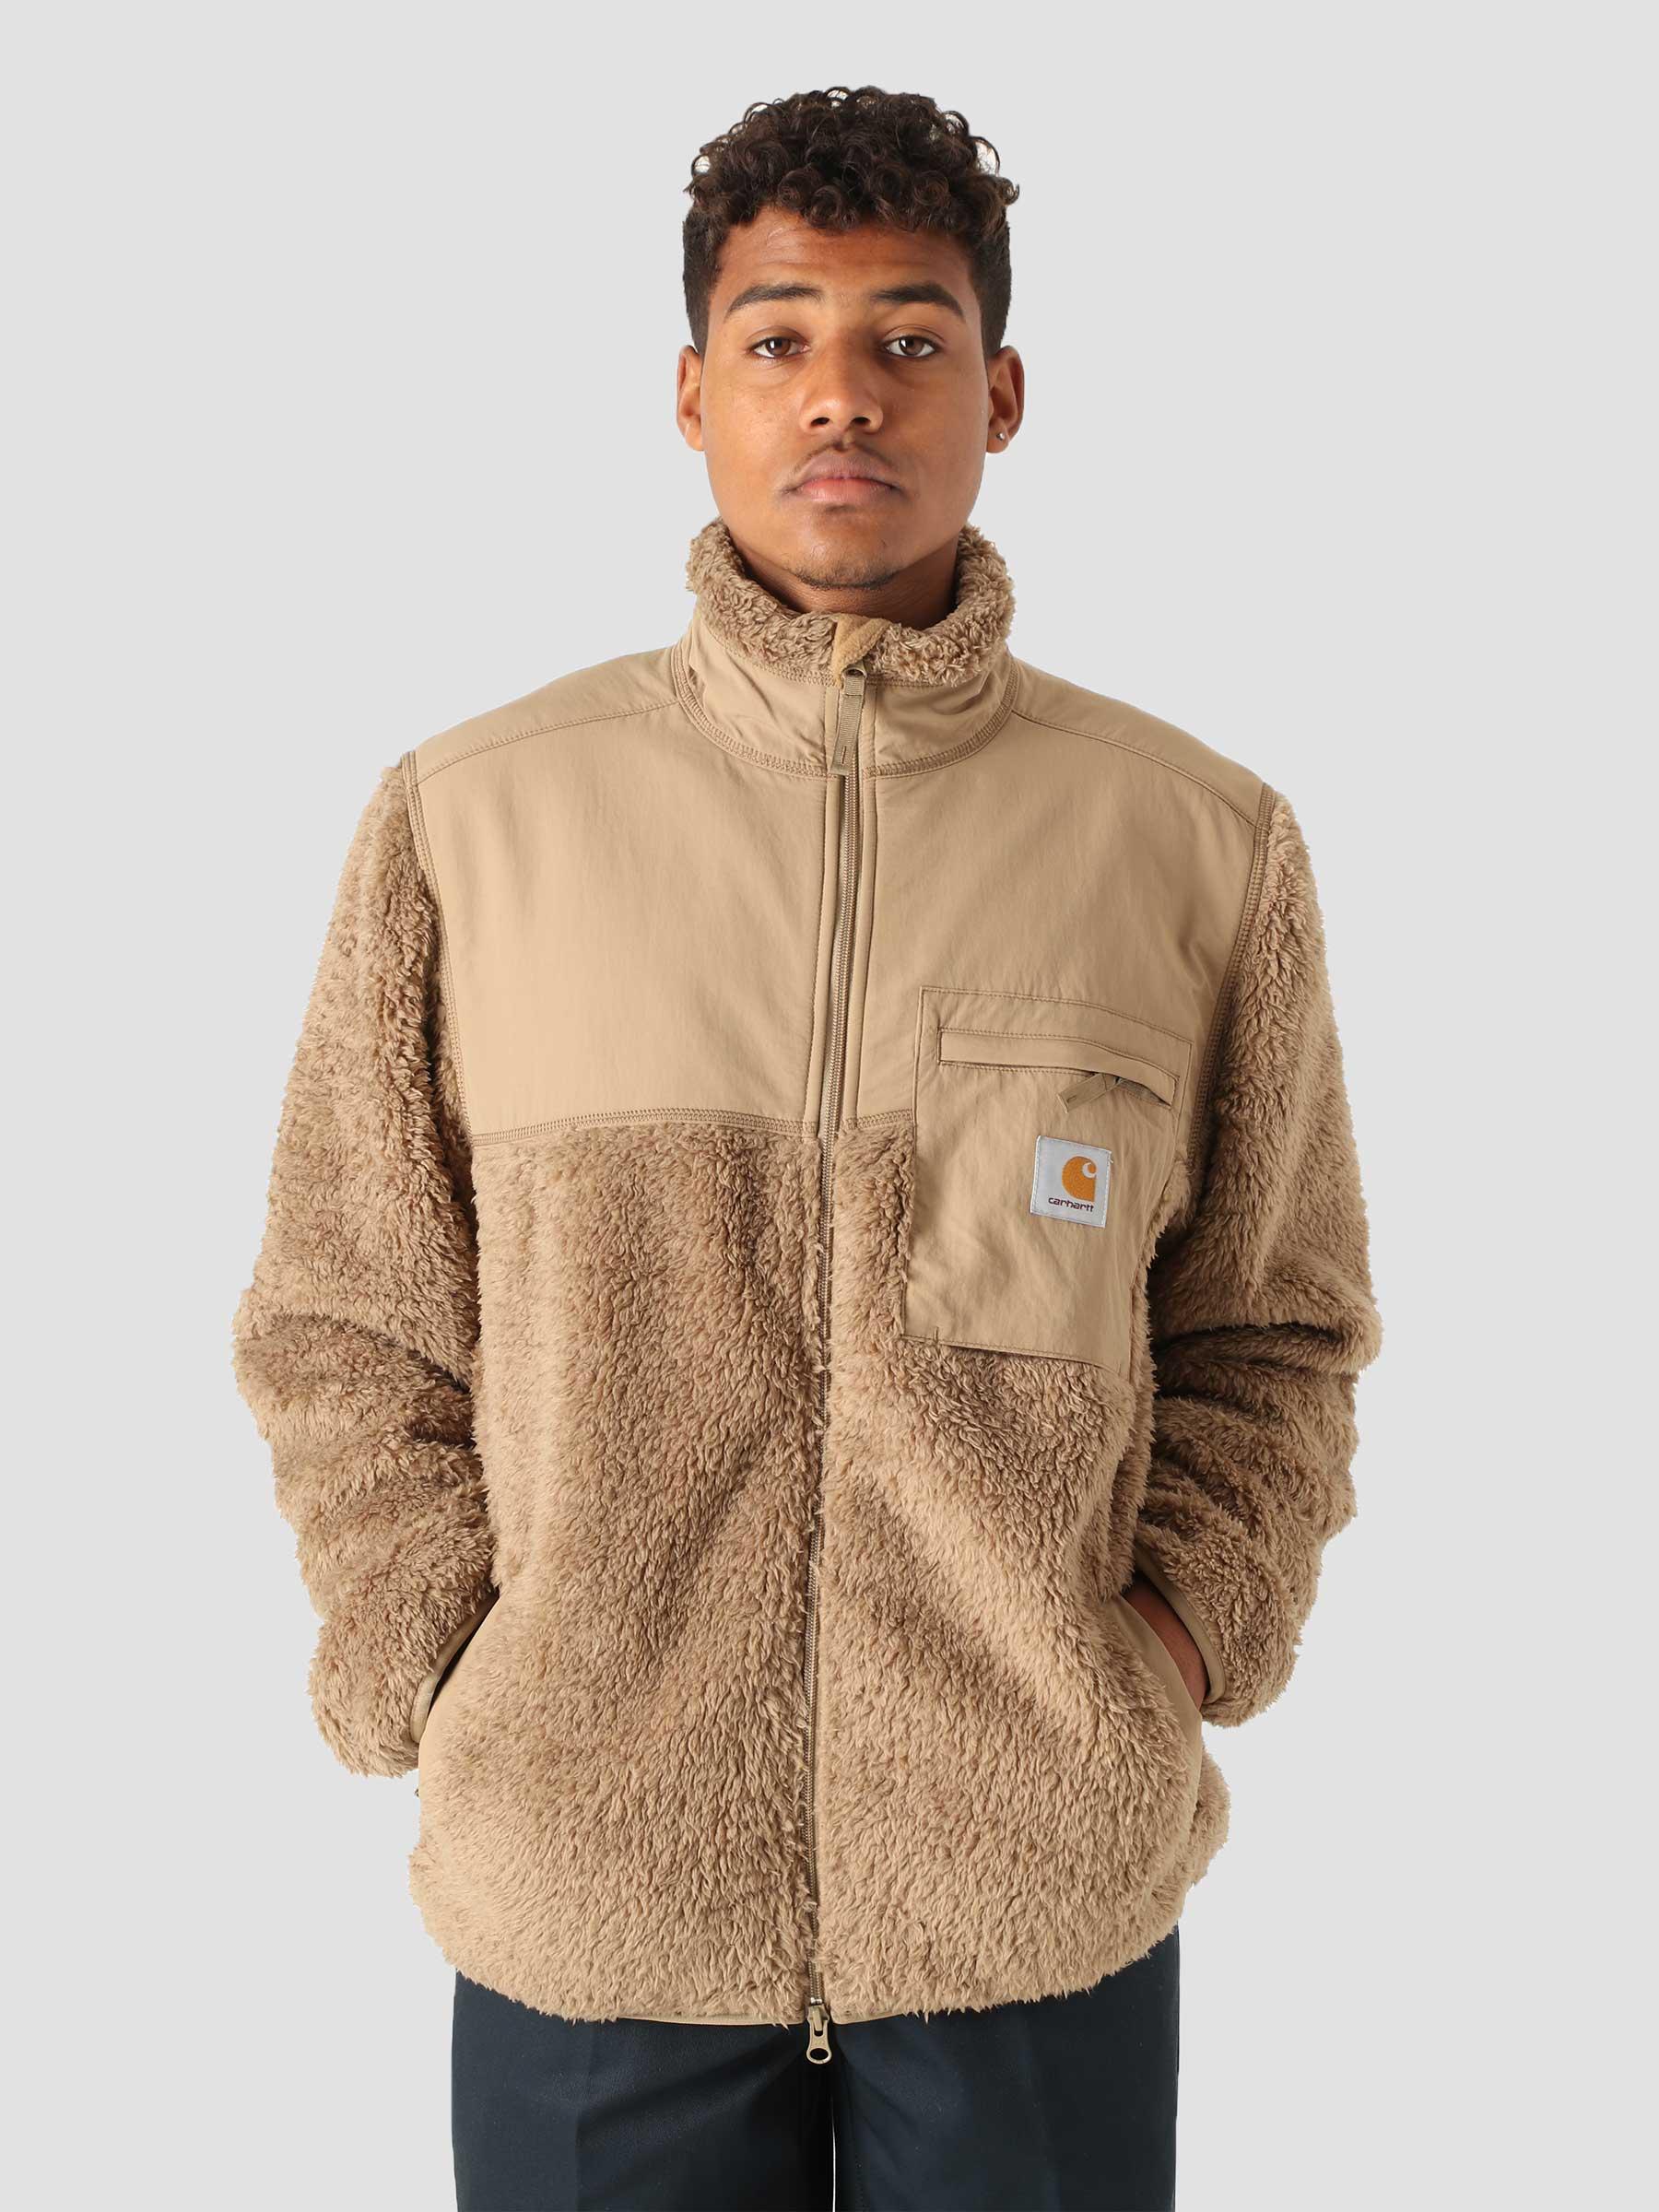 Jackson Sweat Jacket  Tanami I029566